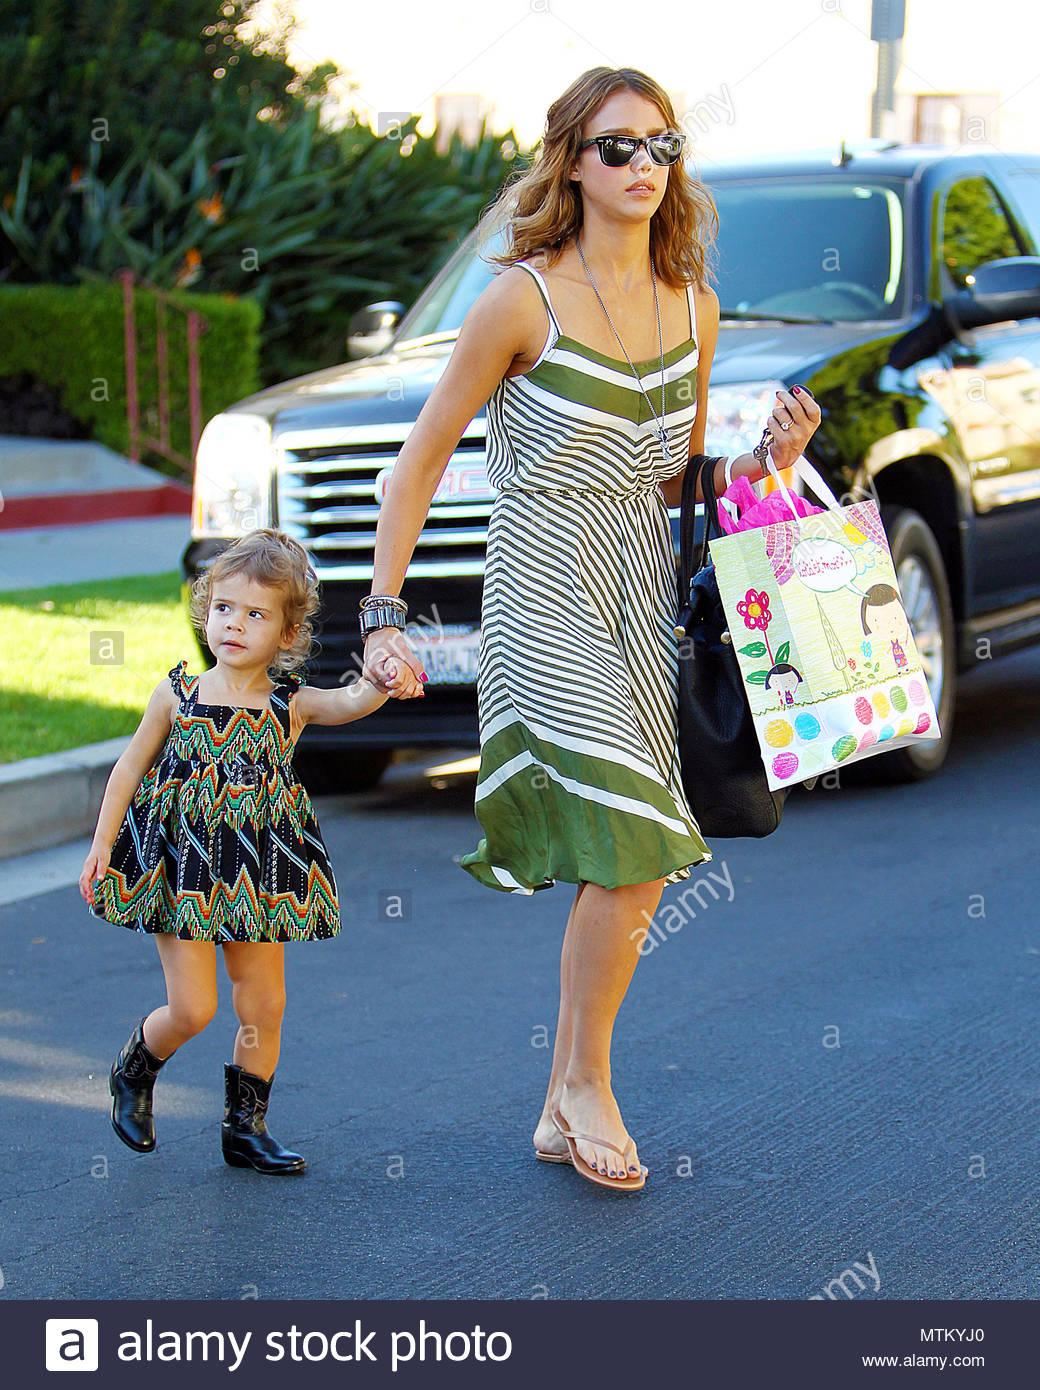 Jessica Alba and daughter, Honor. Jessica Alba takes daughter, Honor ...